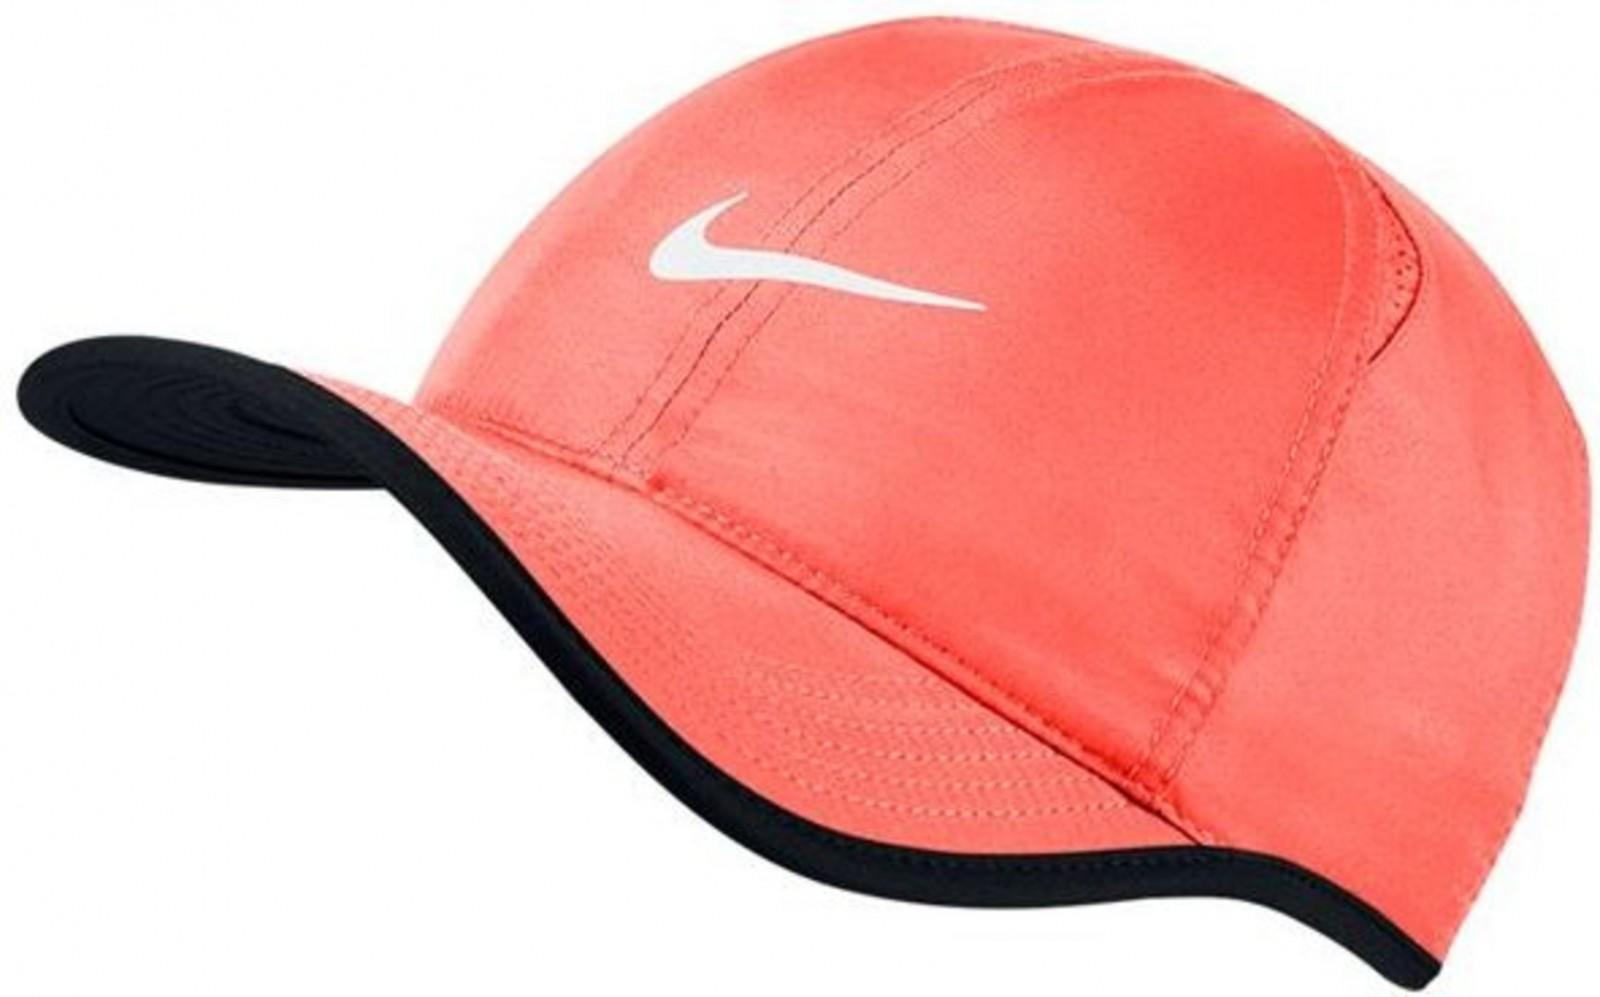 Теннисная кепка Nike Feather Light Cap bright mango